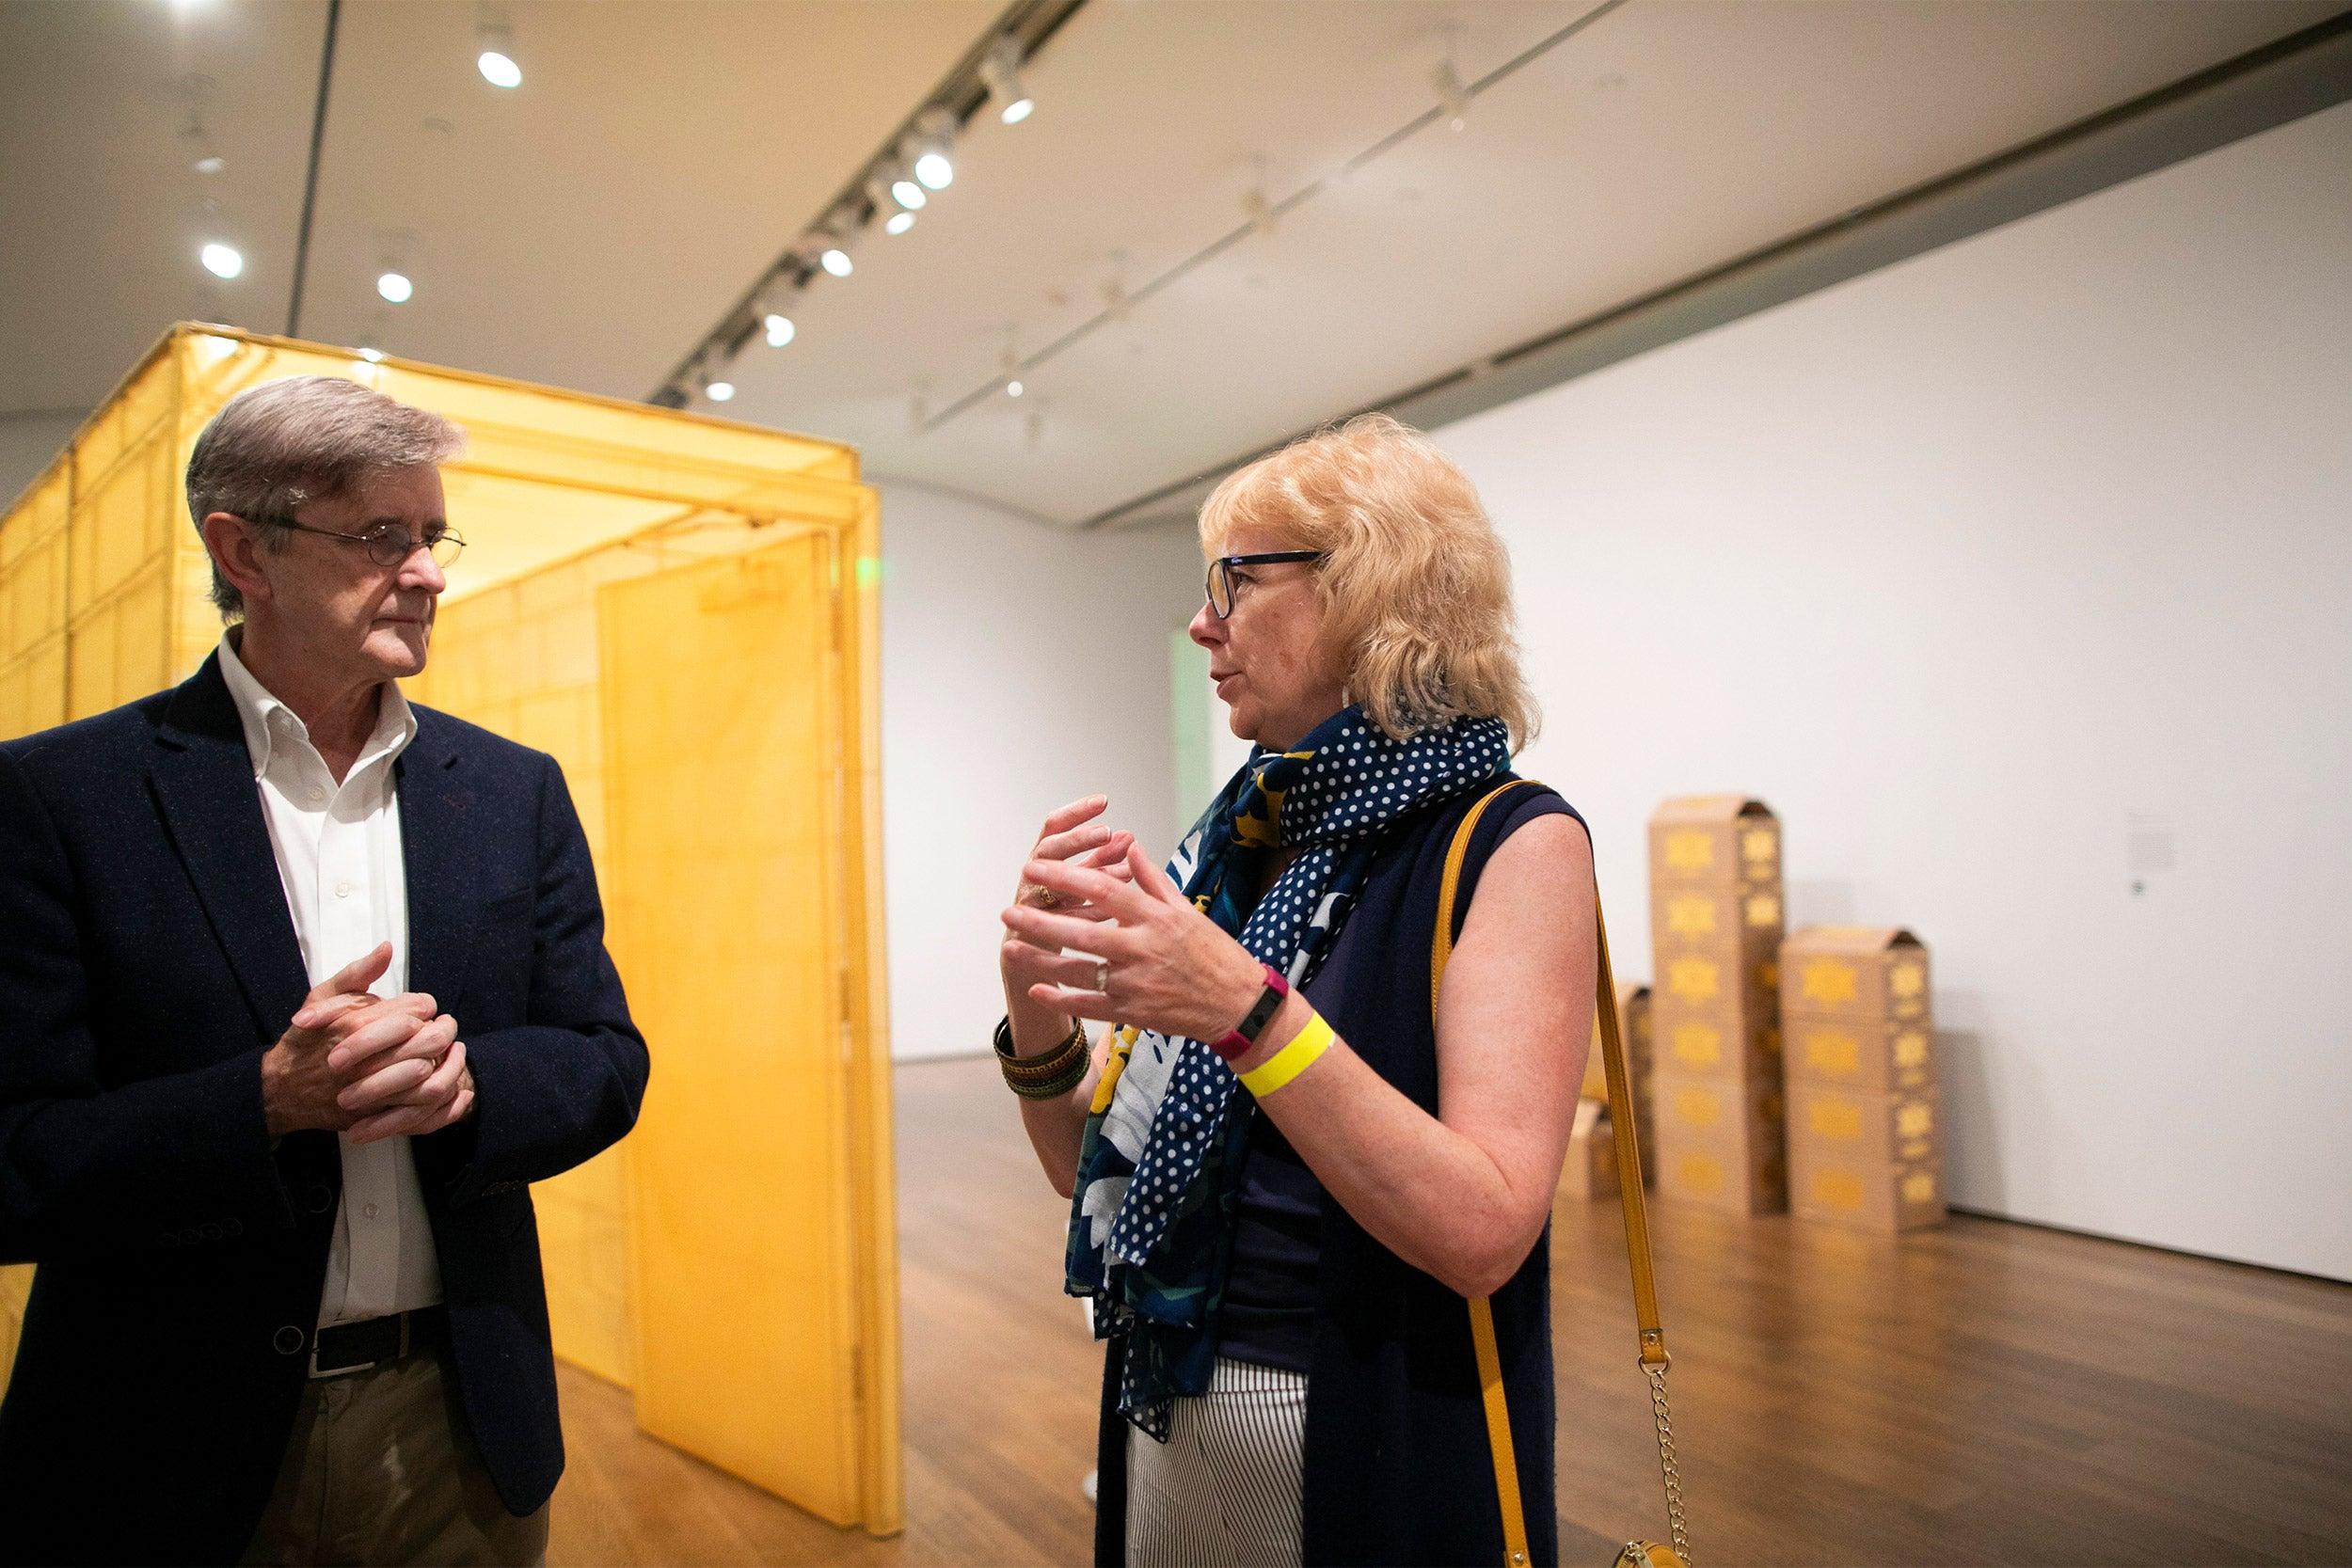 Dean Hempton and his wife, Louanne Hempton.